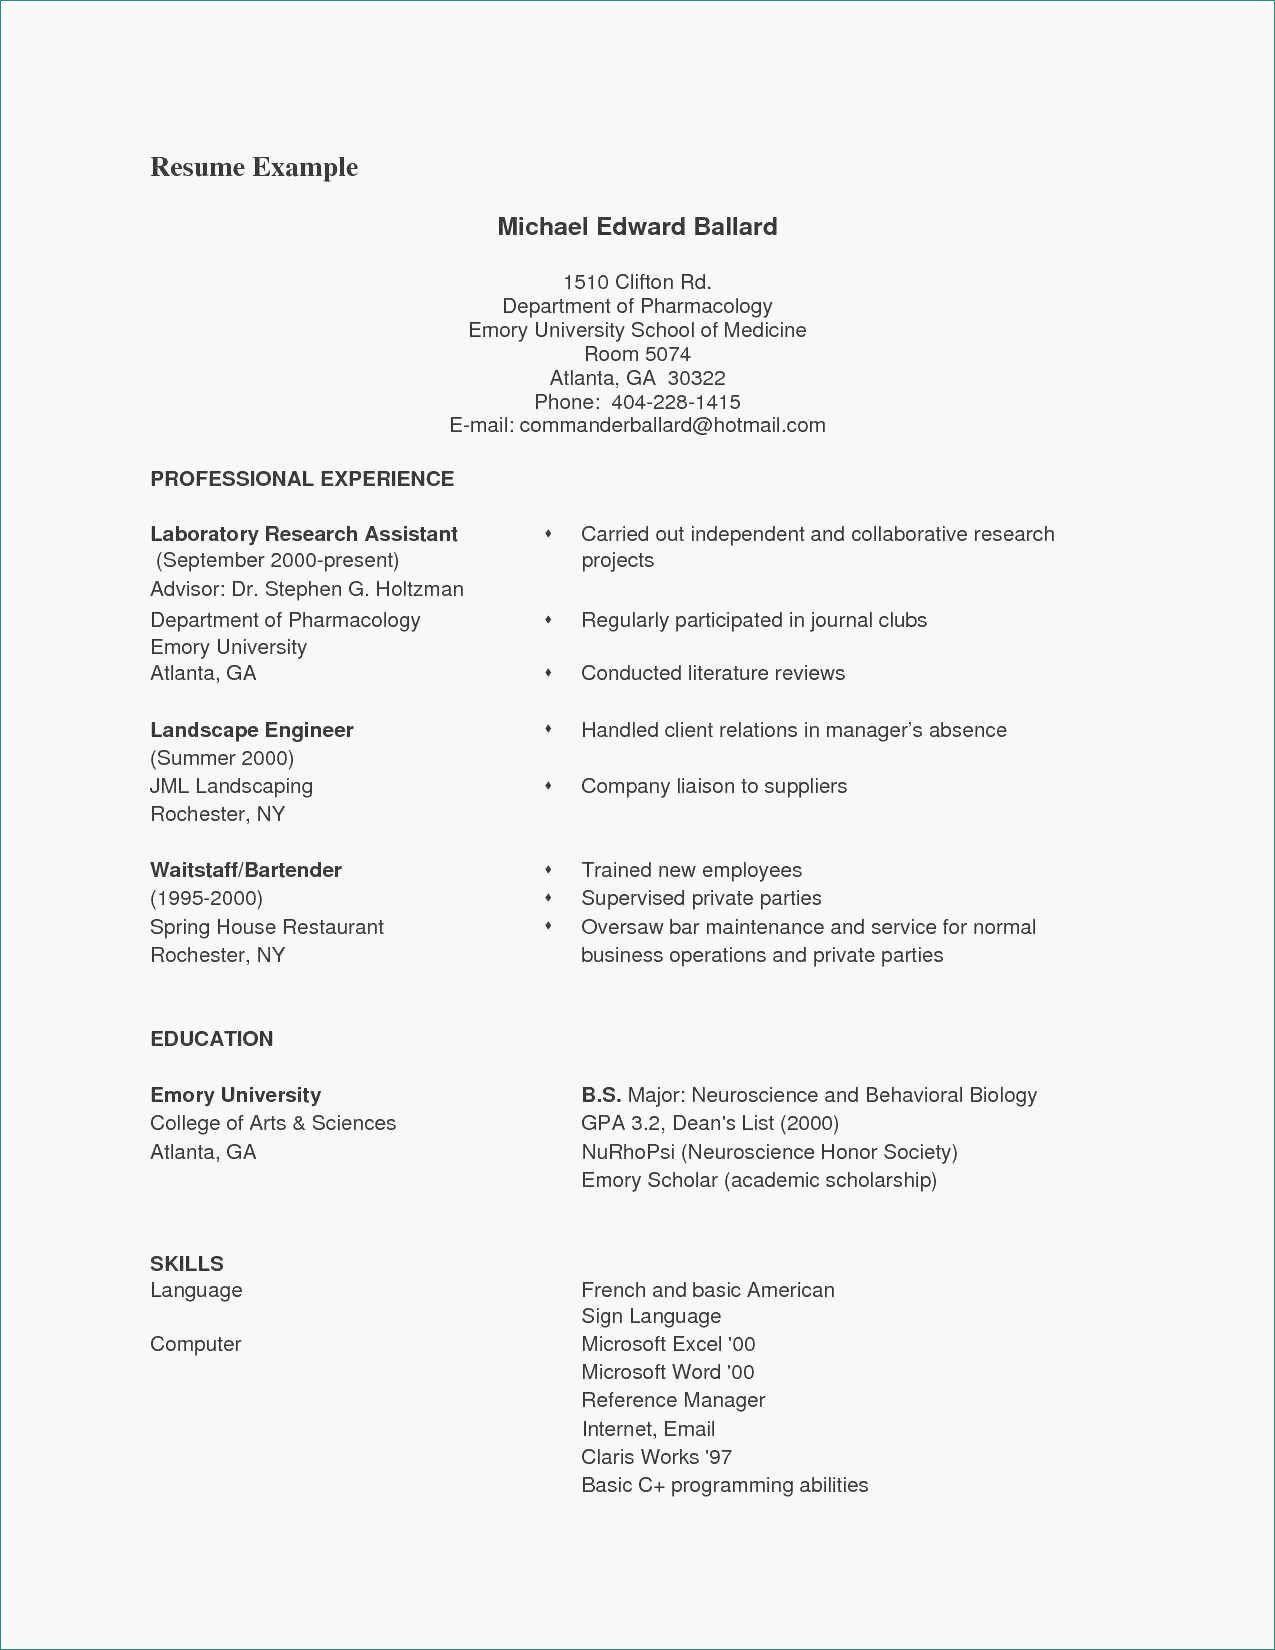 Resume Template Modern & Professional Resume Template